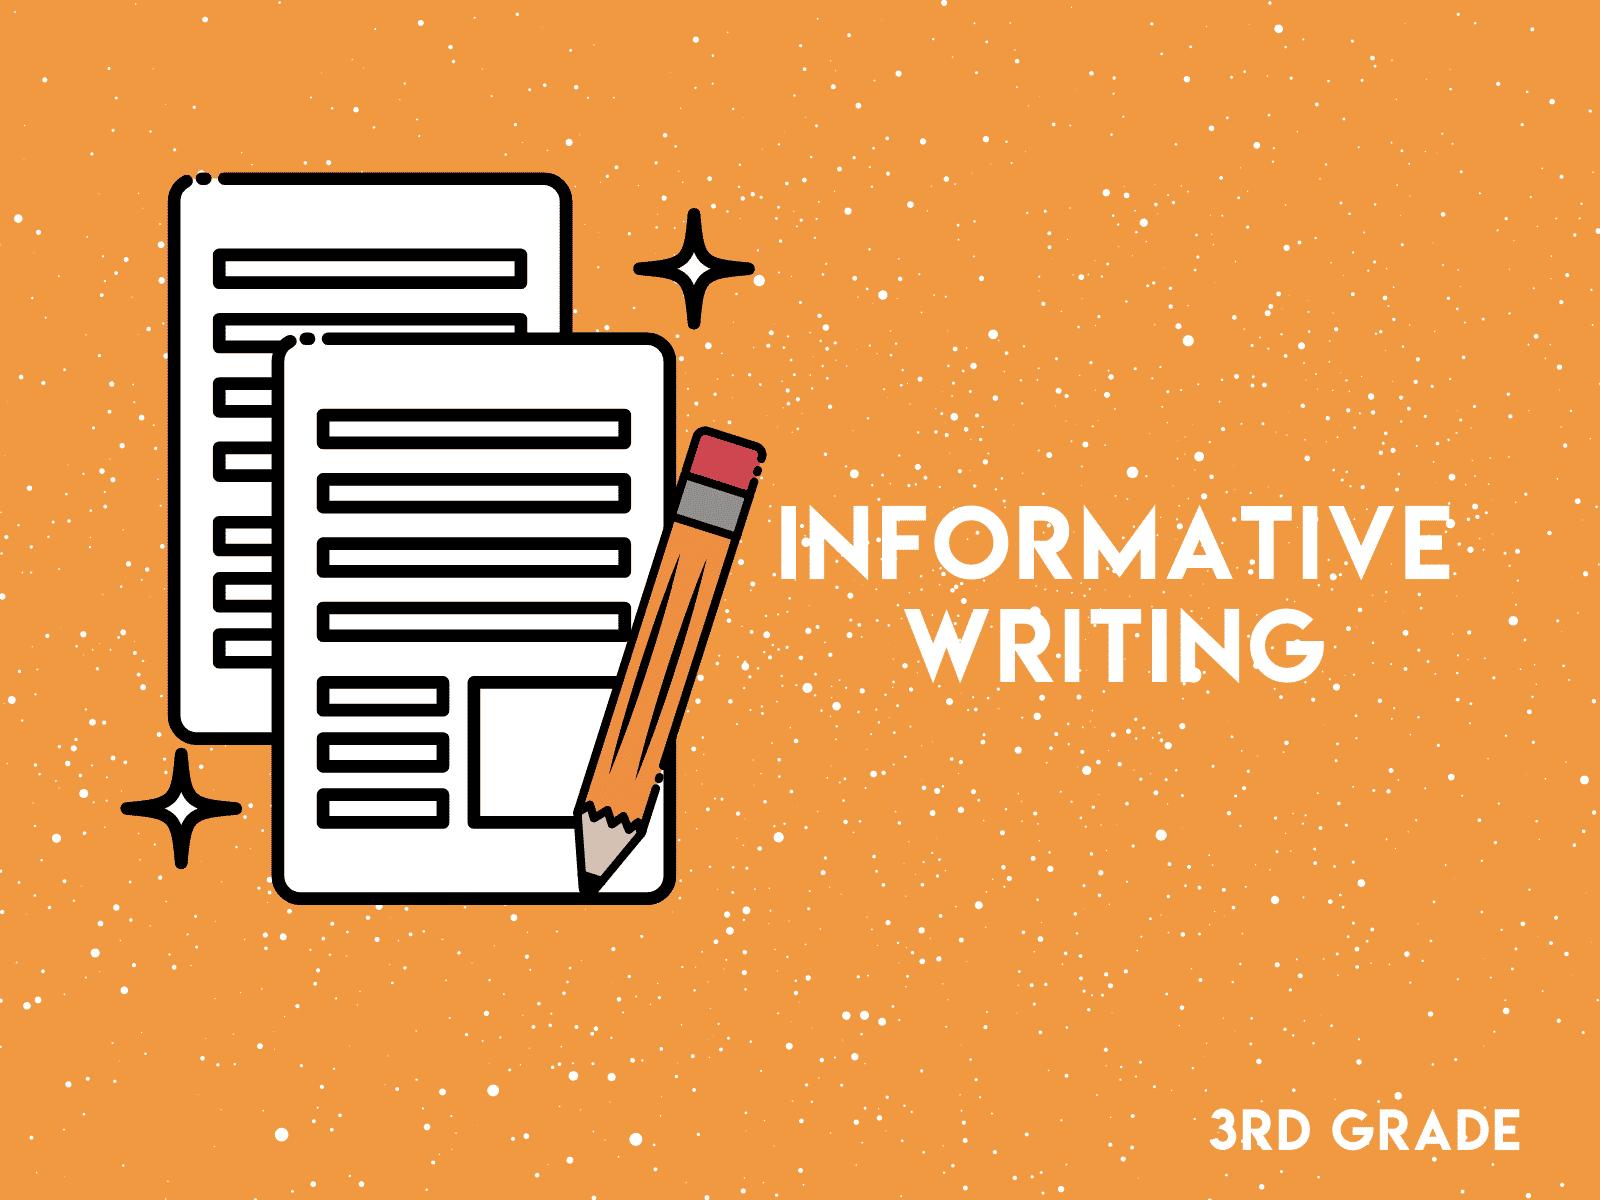 Informative Writing 3rd Grade